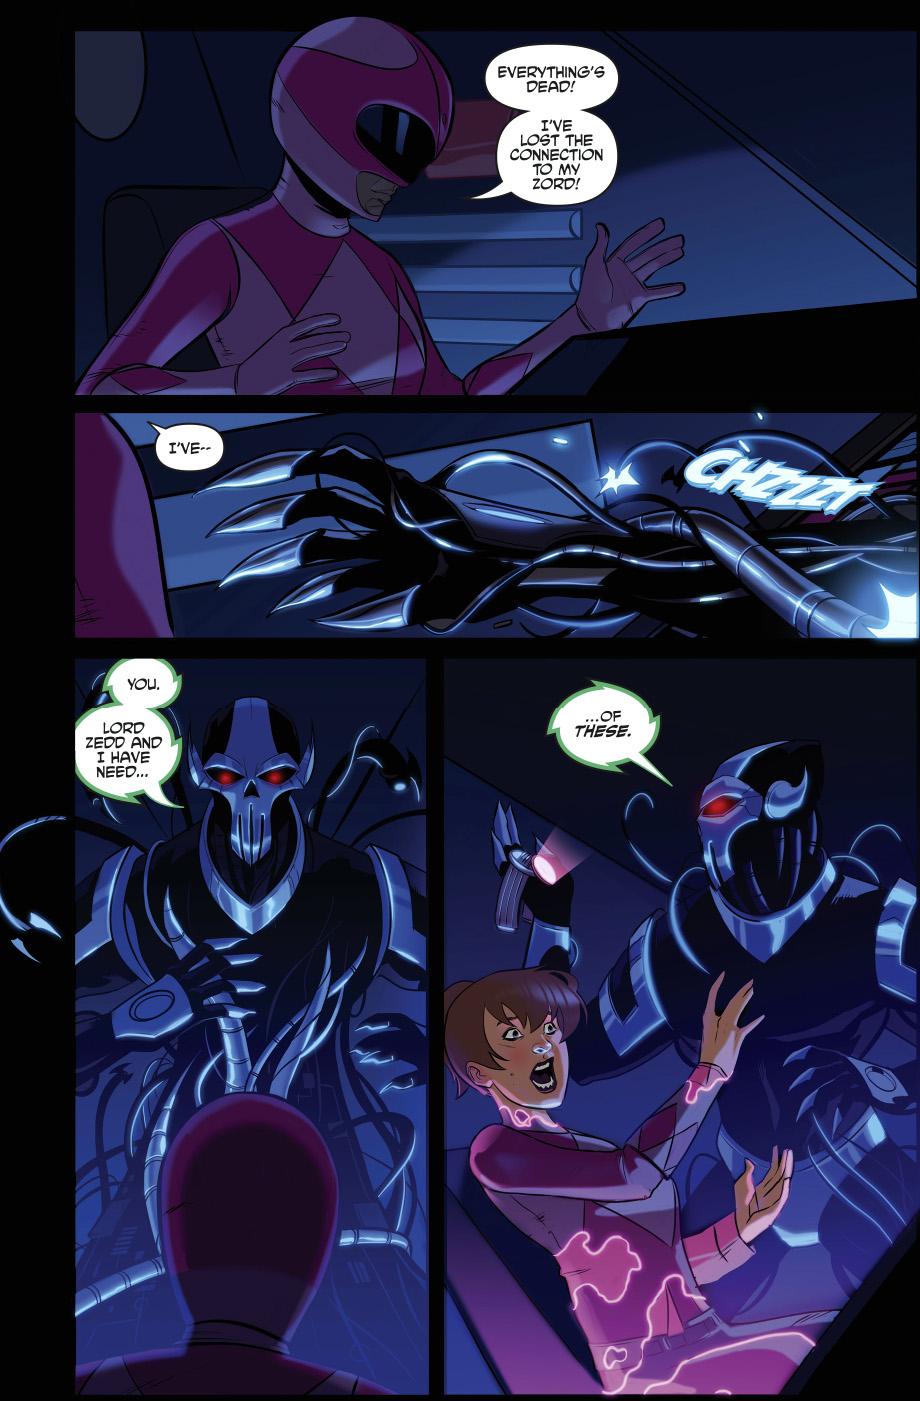 Brainiac Steals The Power Rangers Zords